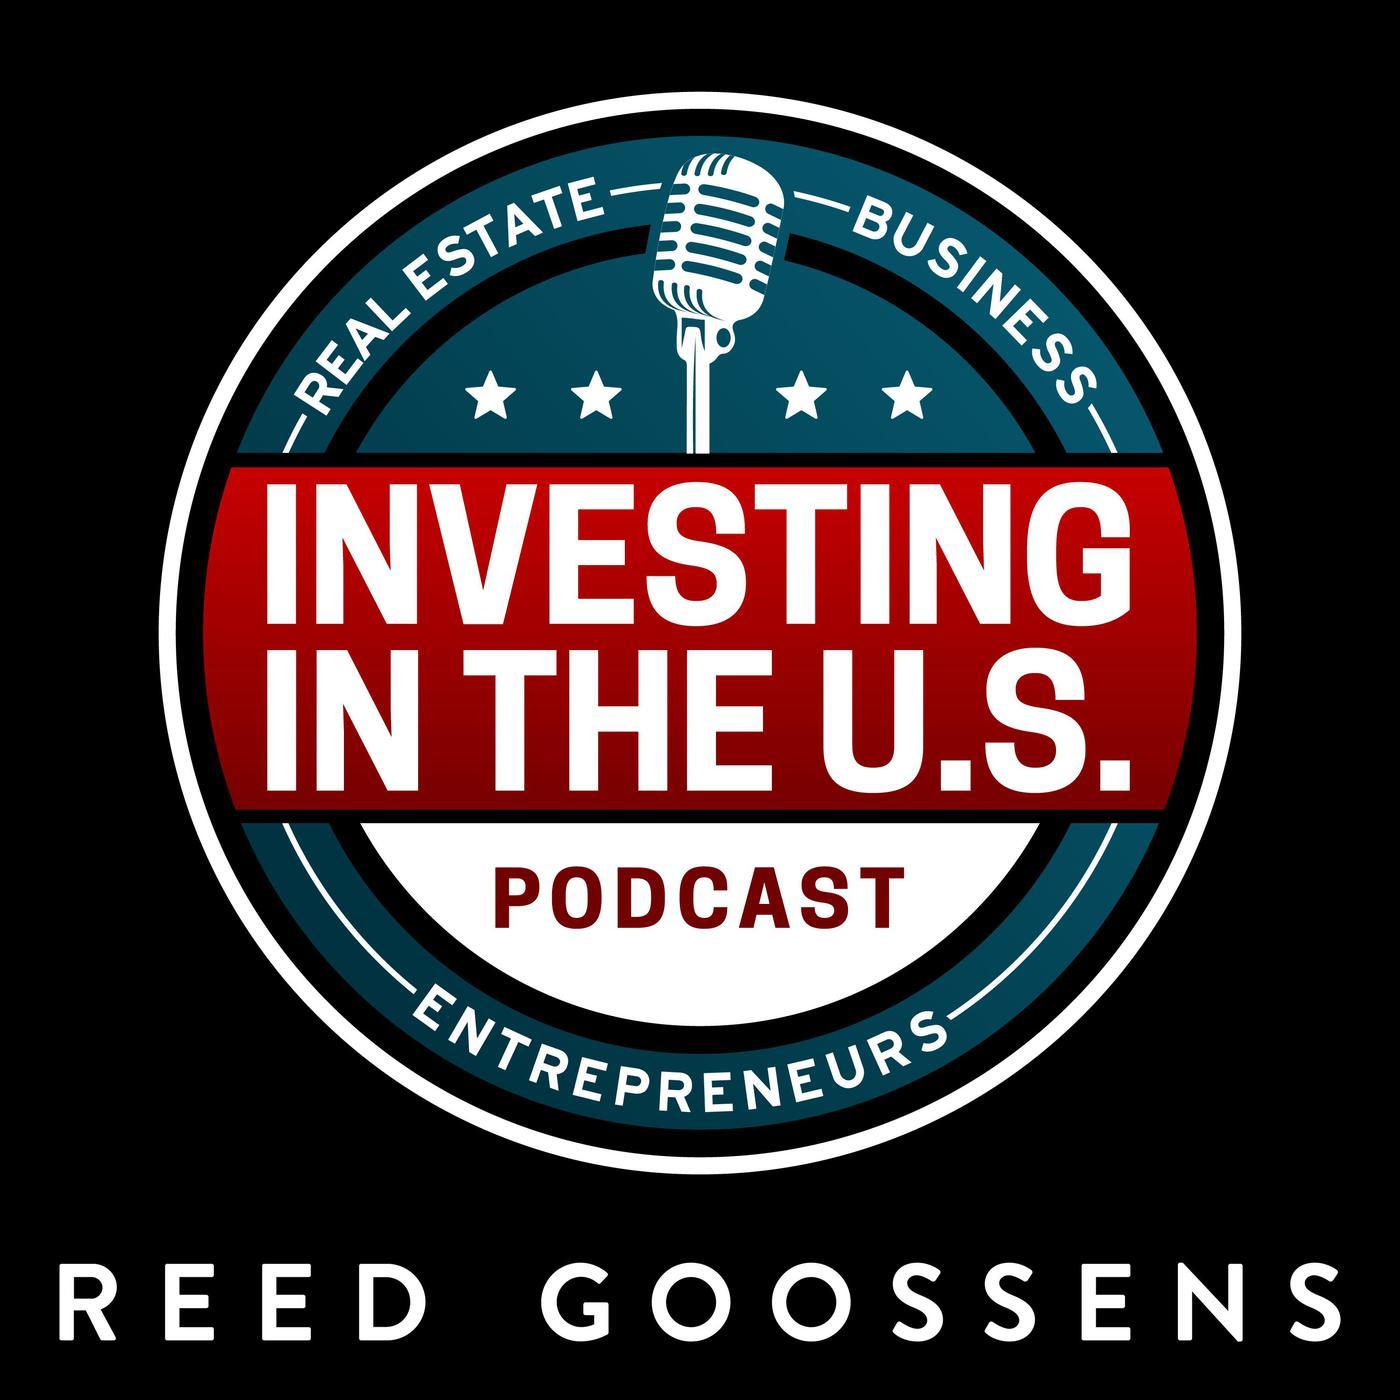 Goossens Design Bank.Investing In The U S 播客 Reed Goossens Listen Notes